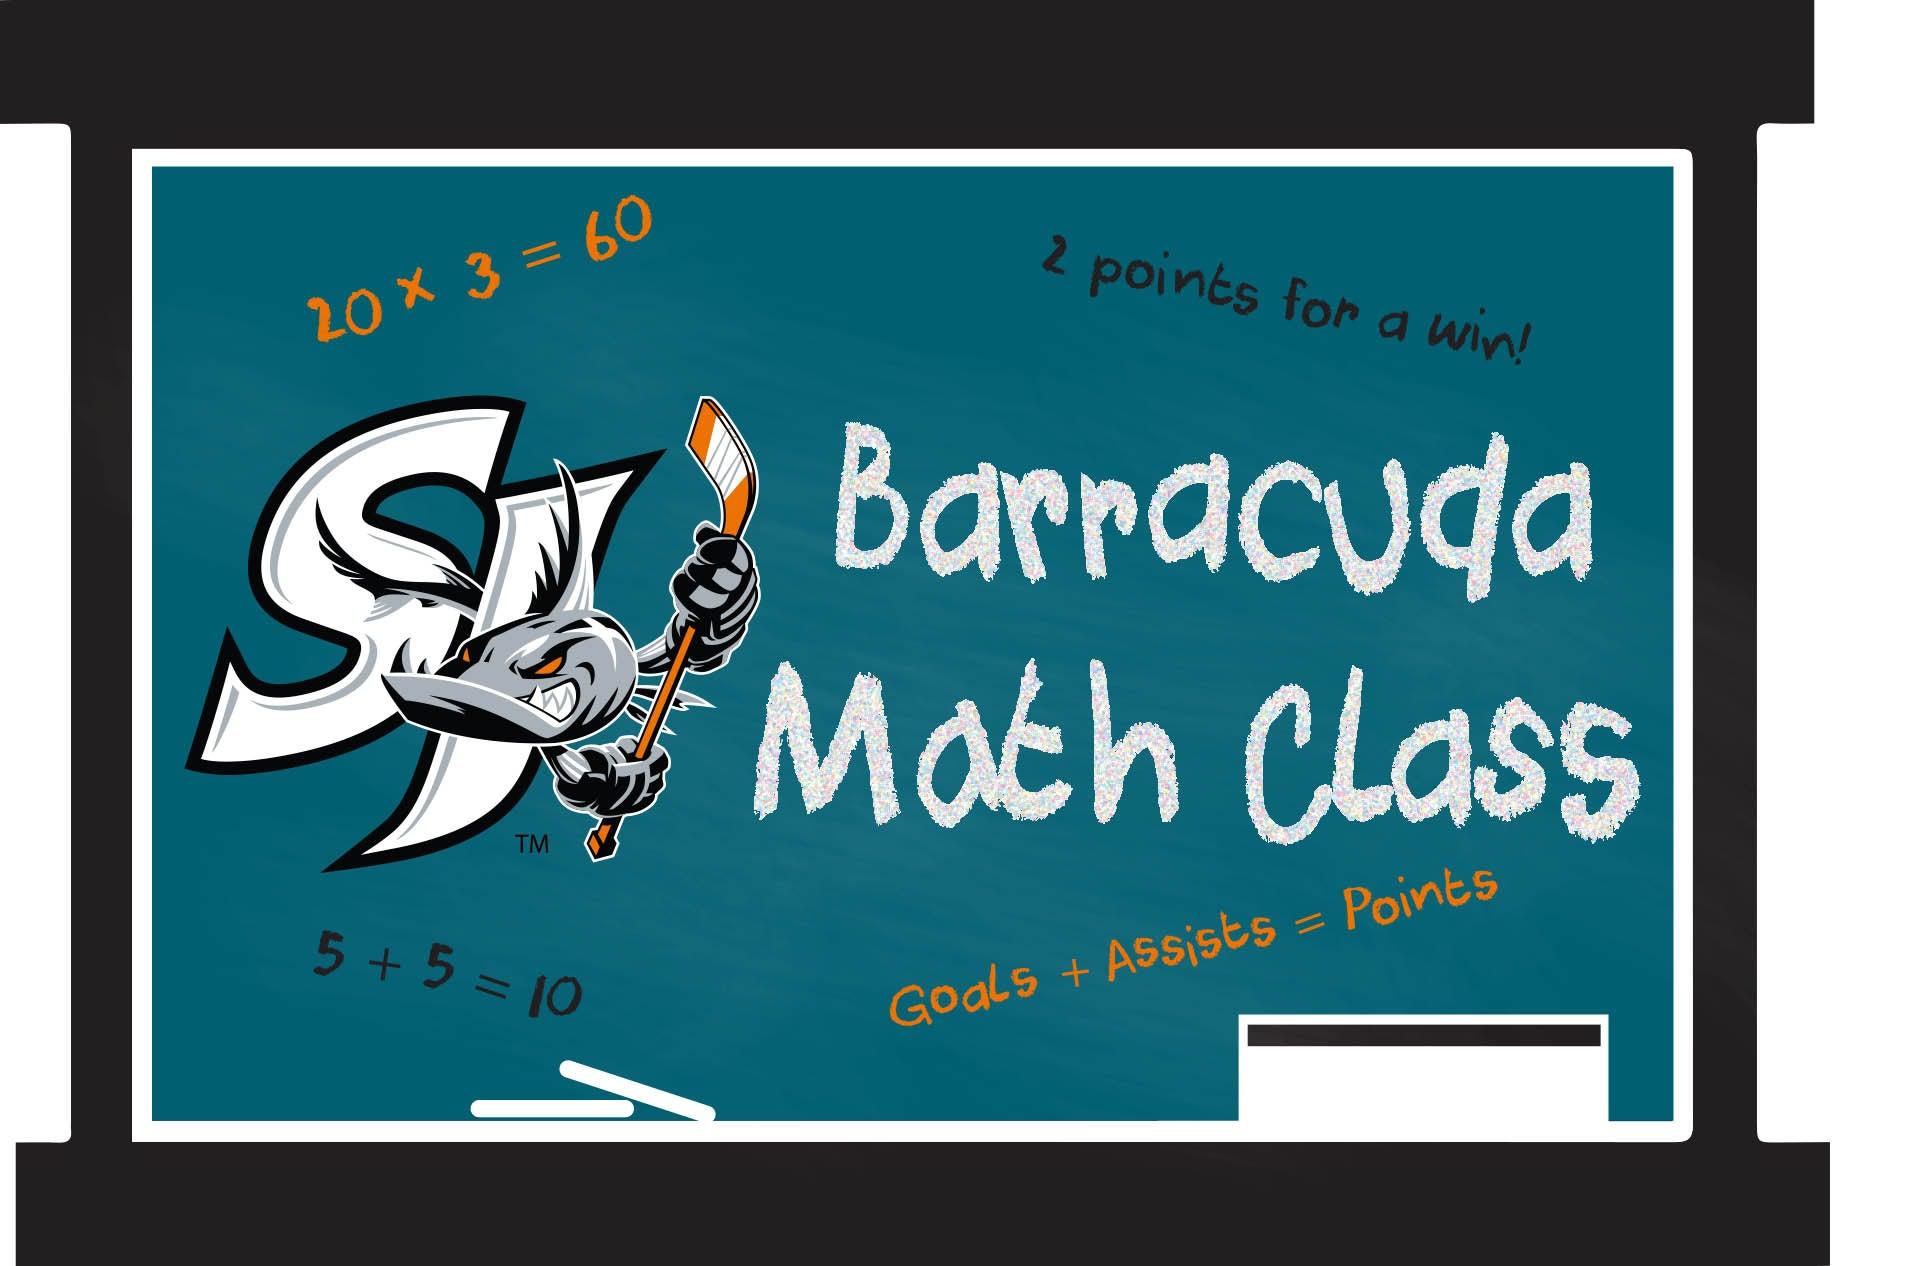 Barracuda Math Class | San Jose Barracuda